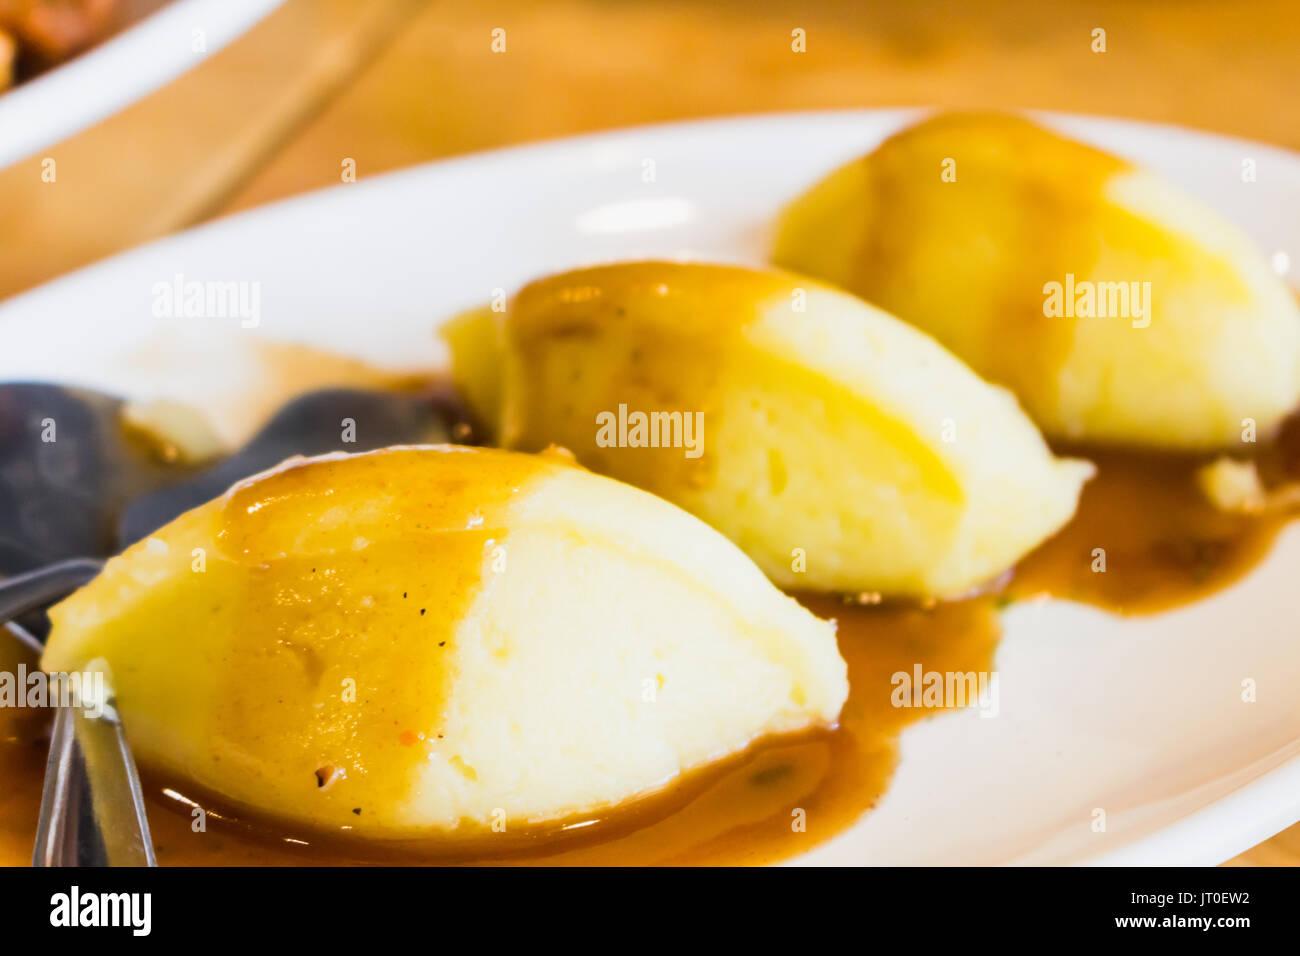 mash potato on mini dish ready to eat - Stock Image